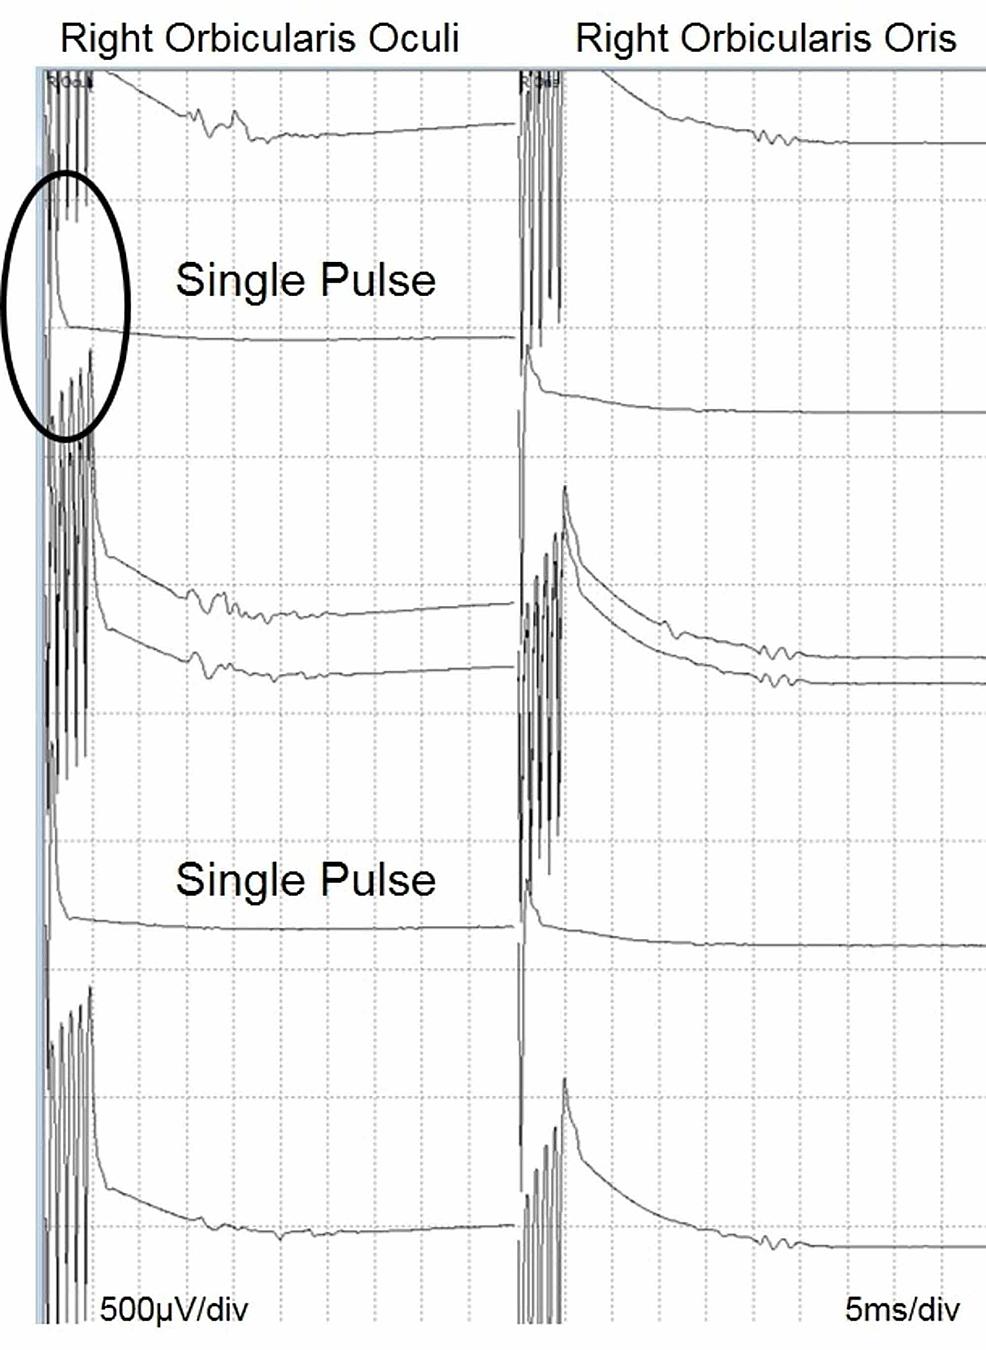 Co-bulb-MEP-from-facial-nerve-–-circle-indicates-single-pulse-stimulation